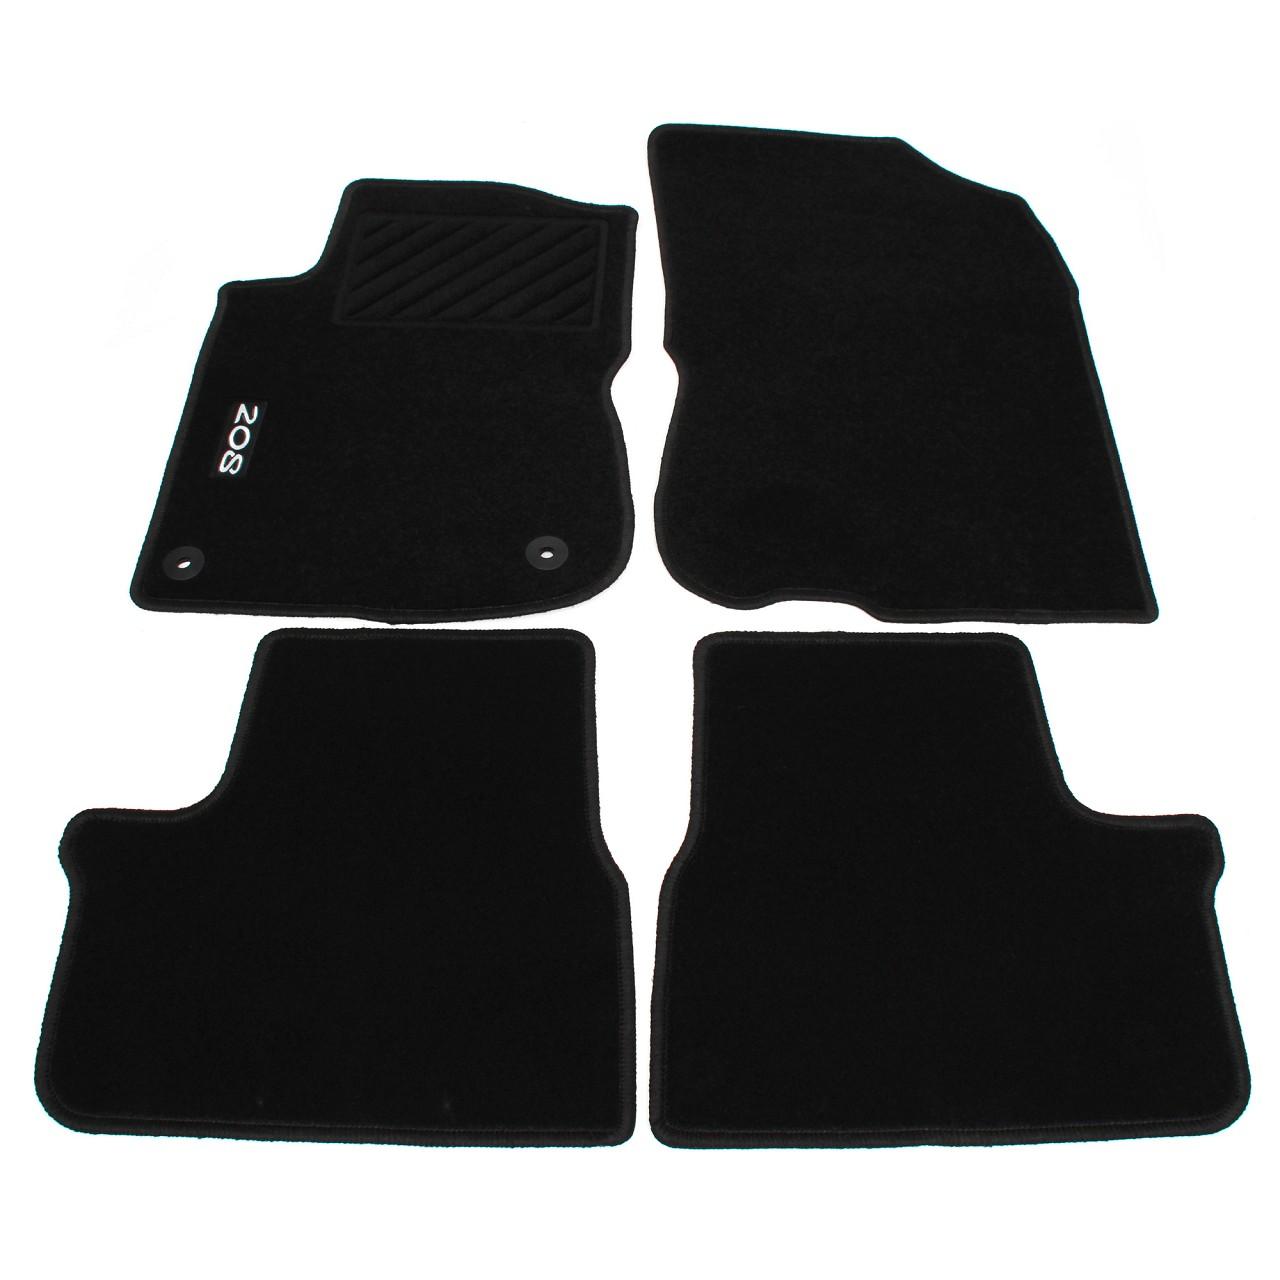 ORIGINAL Peugeot Veloursmatten Textilmatten Fußmatten Satz 208 4-tlg 1606631780